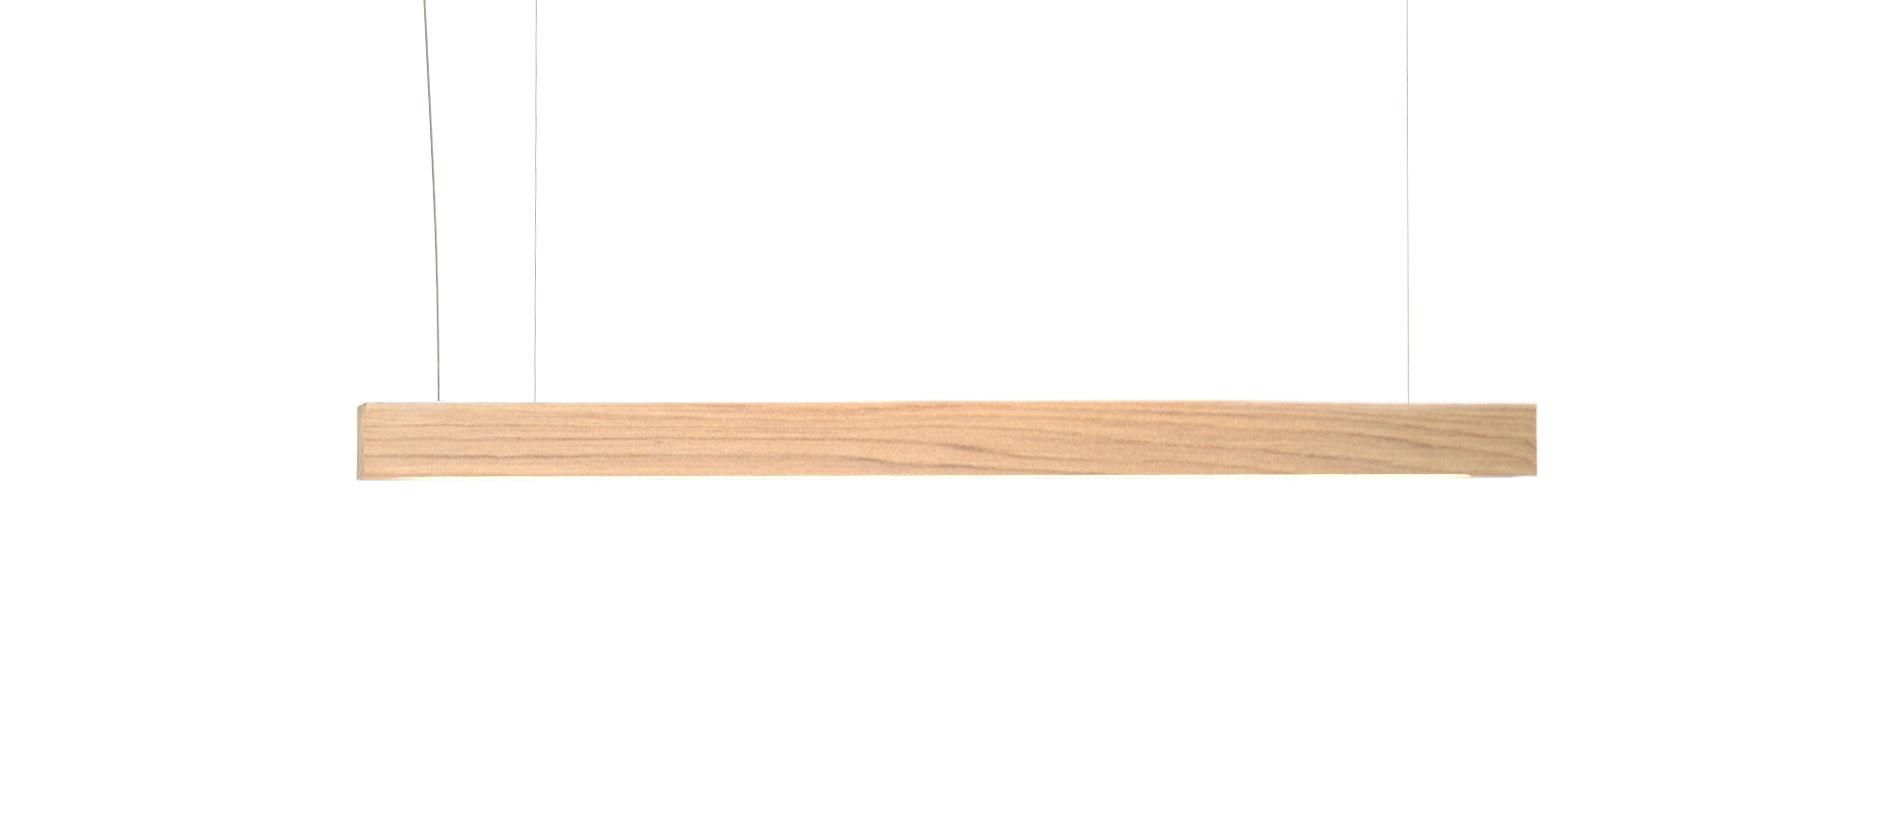 Lighting - Pendant Lighting - Led40 Pendant - / L 70 cm - Oak by Tunto - L 70 cm / Oak - Oiled solid oak, Polypropylene